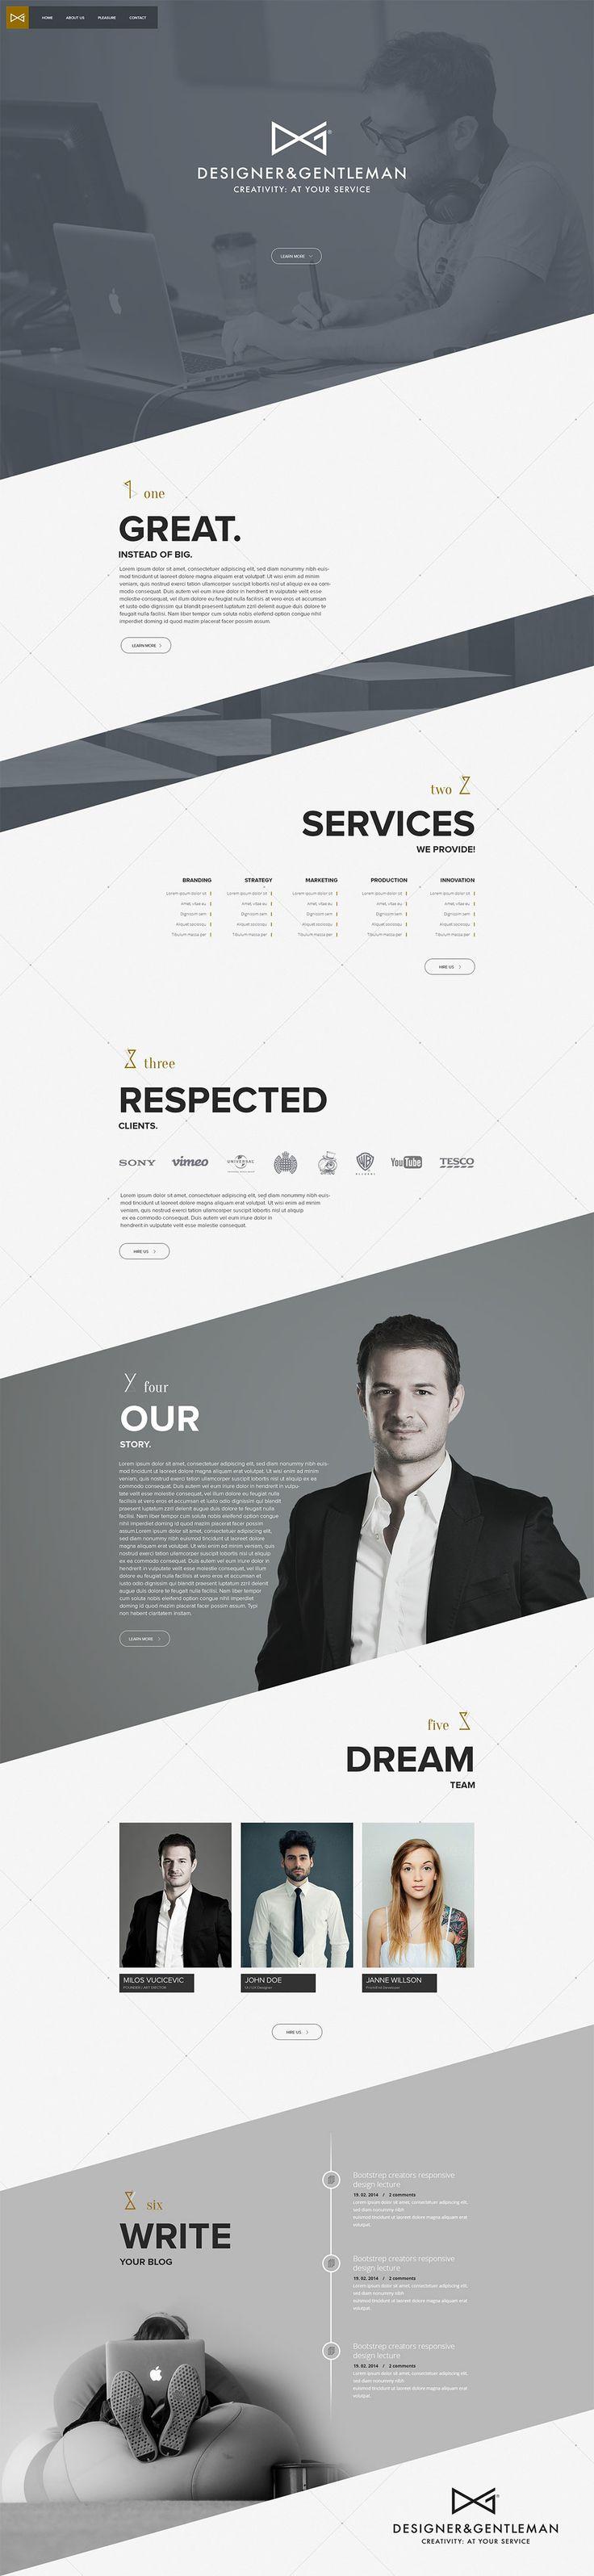 Nice Design!!!